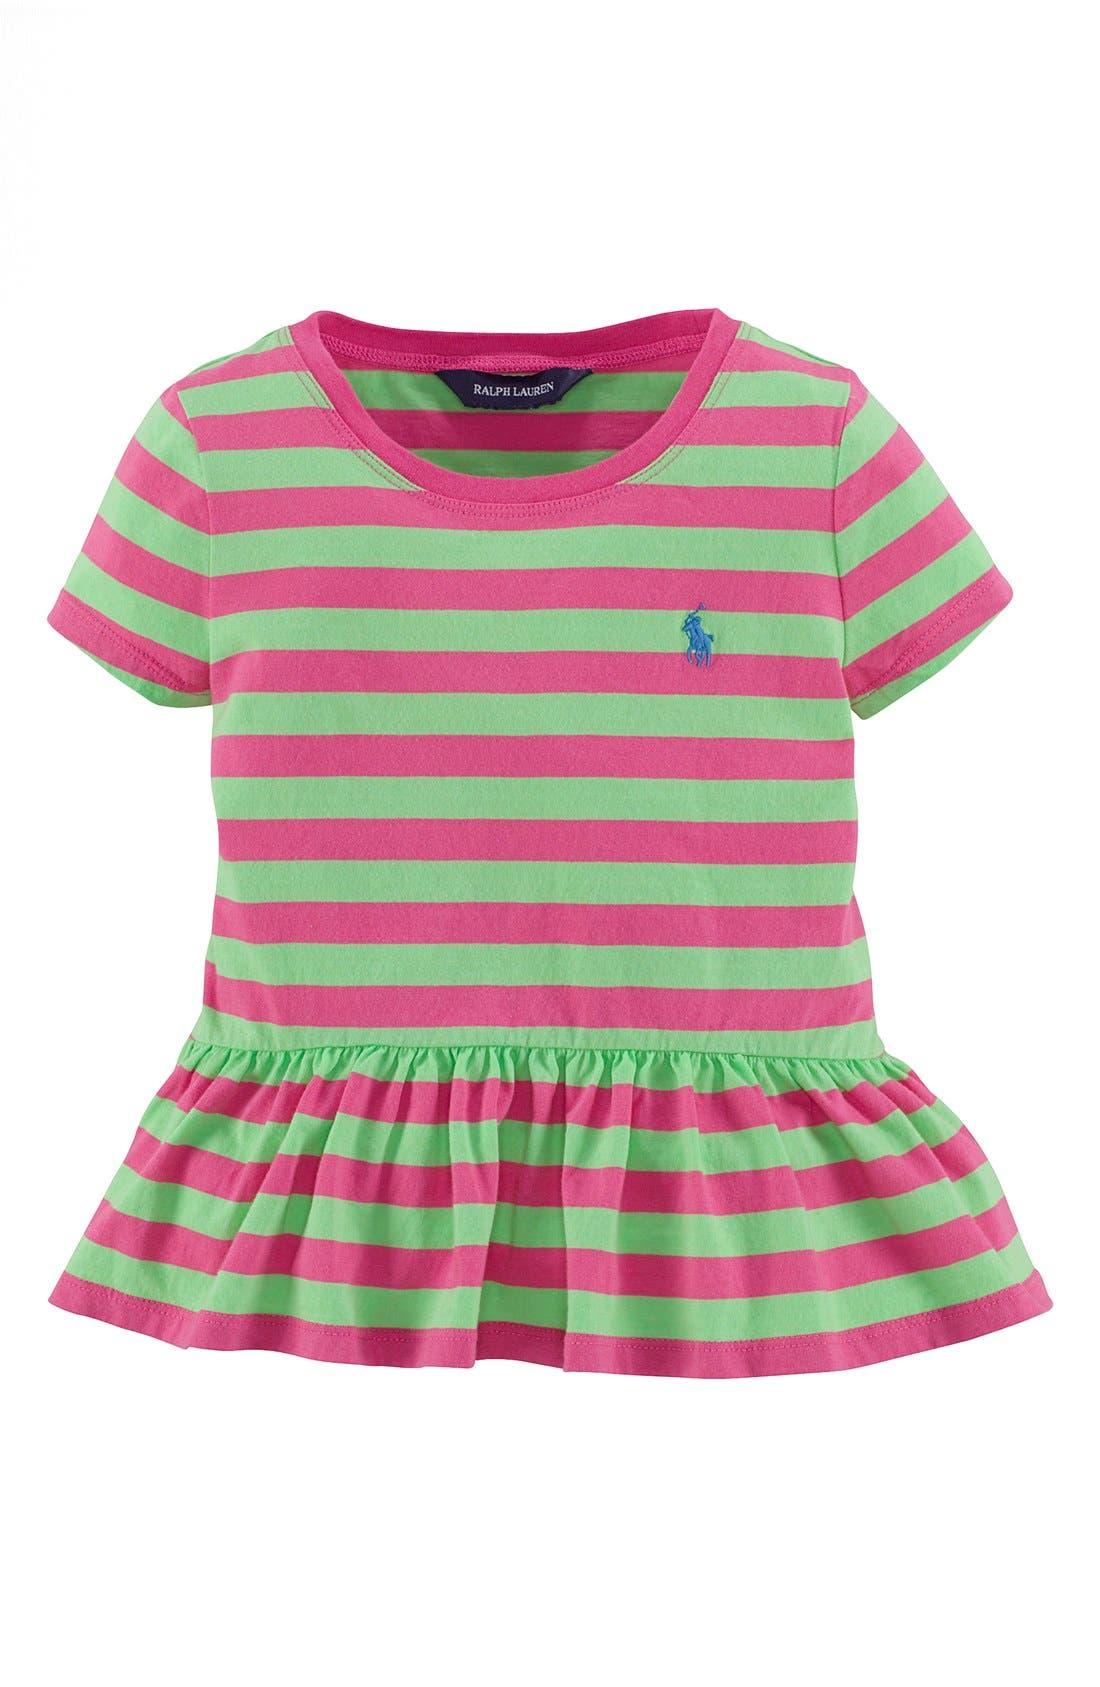 Alternate Image 1 Selected - Ralph Lauren Stripe Peplum Tee (Toddler Girls)